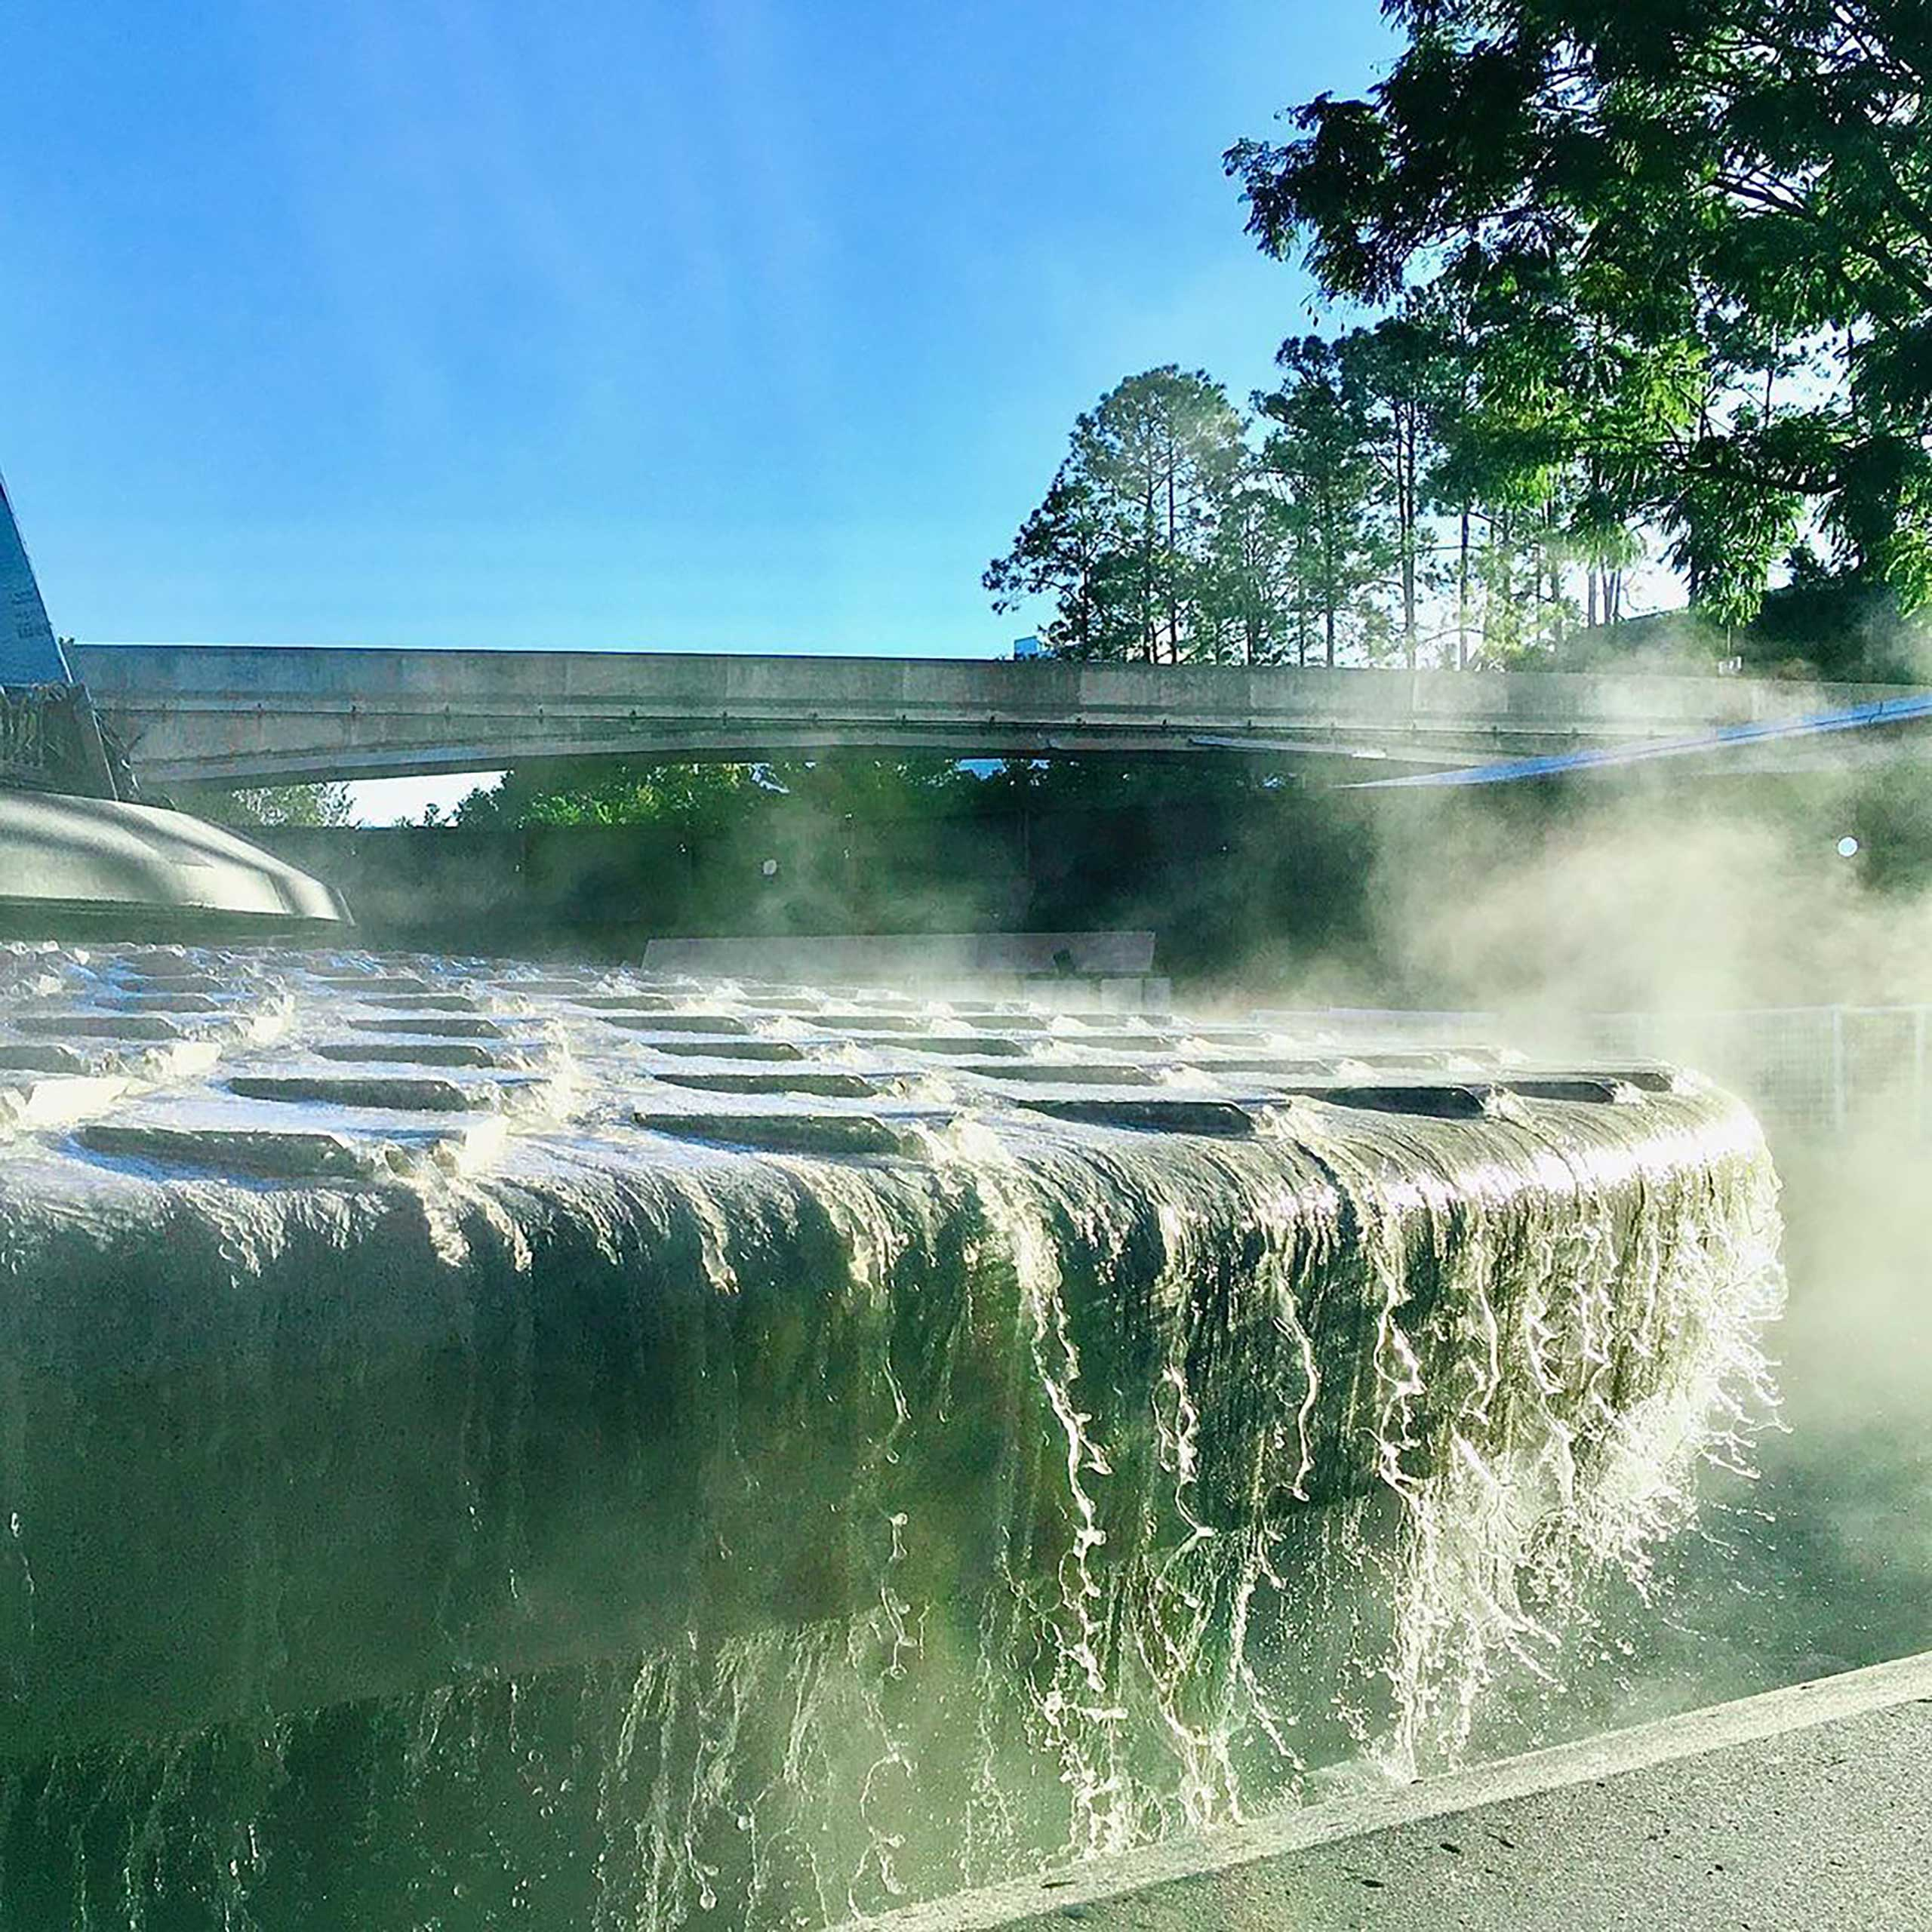 EPCOT main entrance fountain details during construction